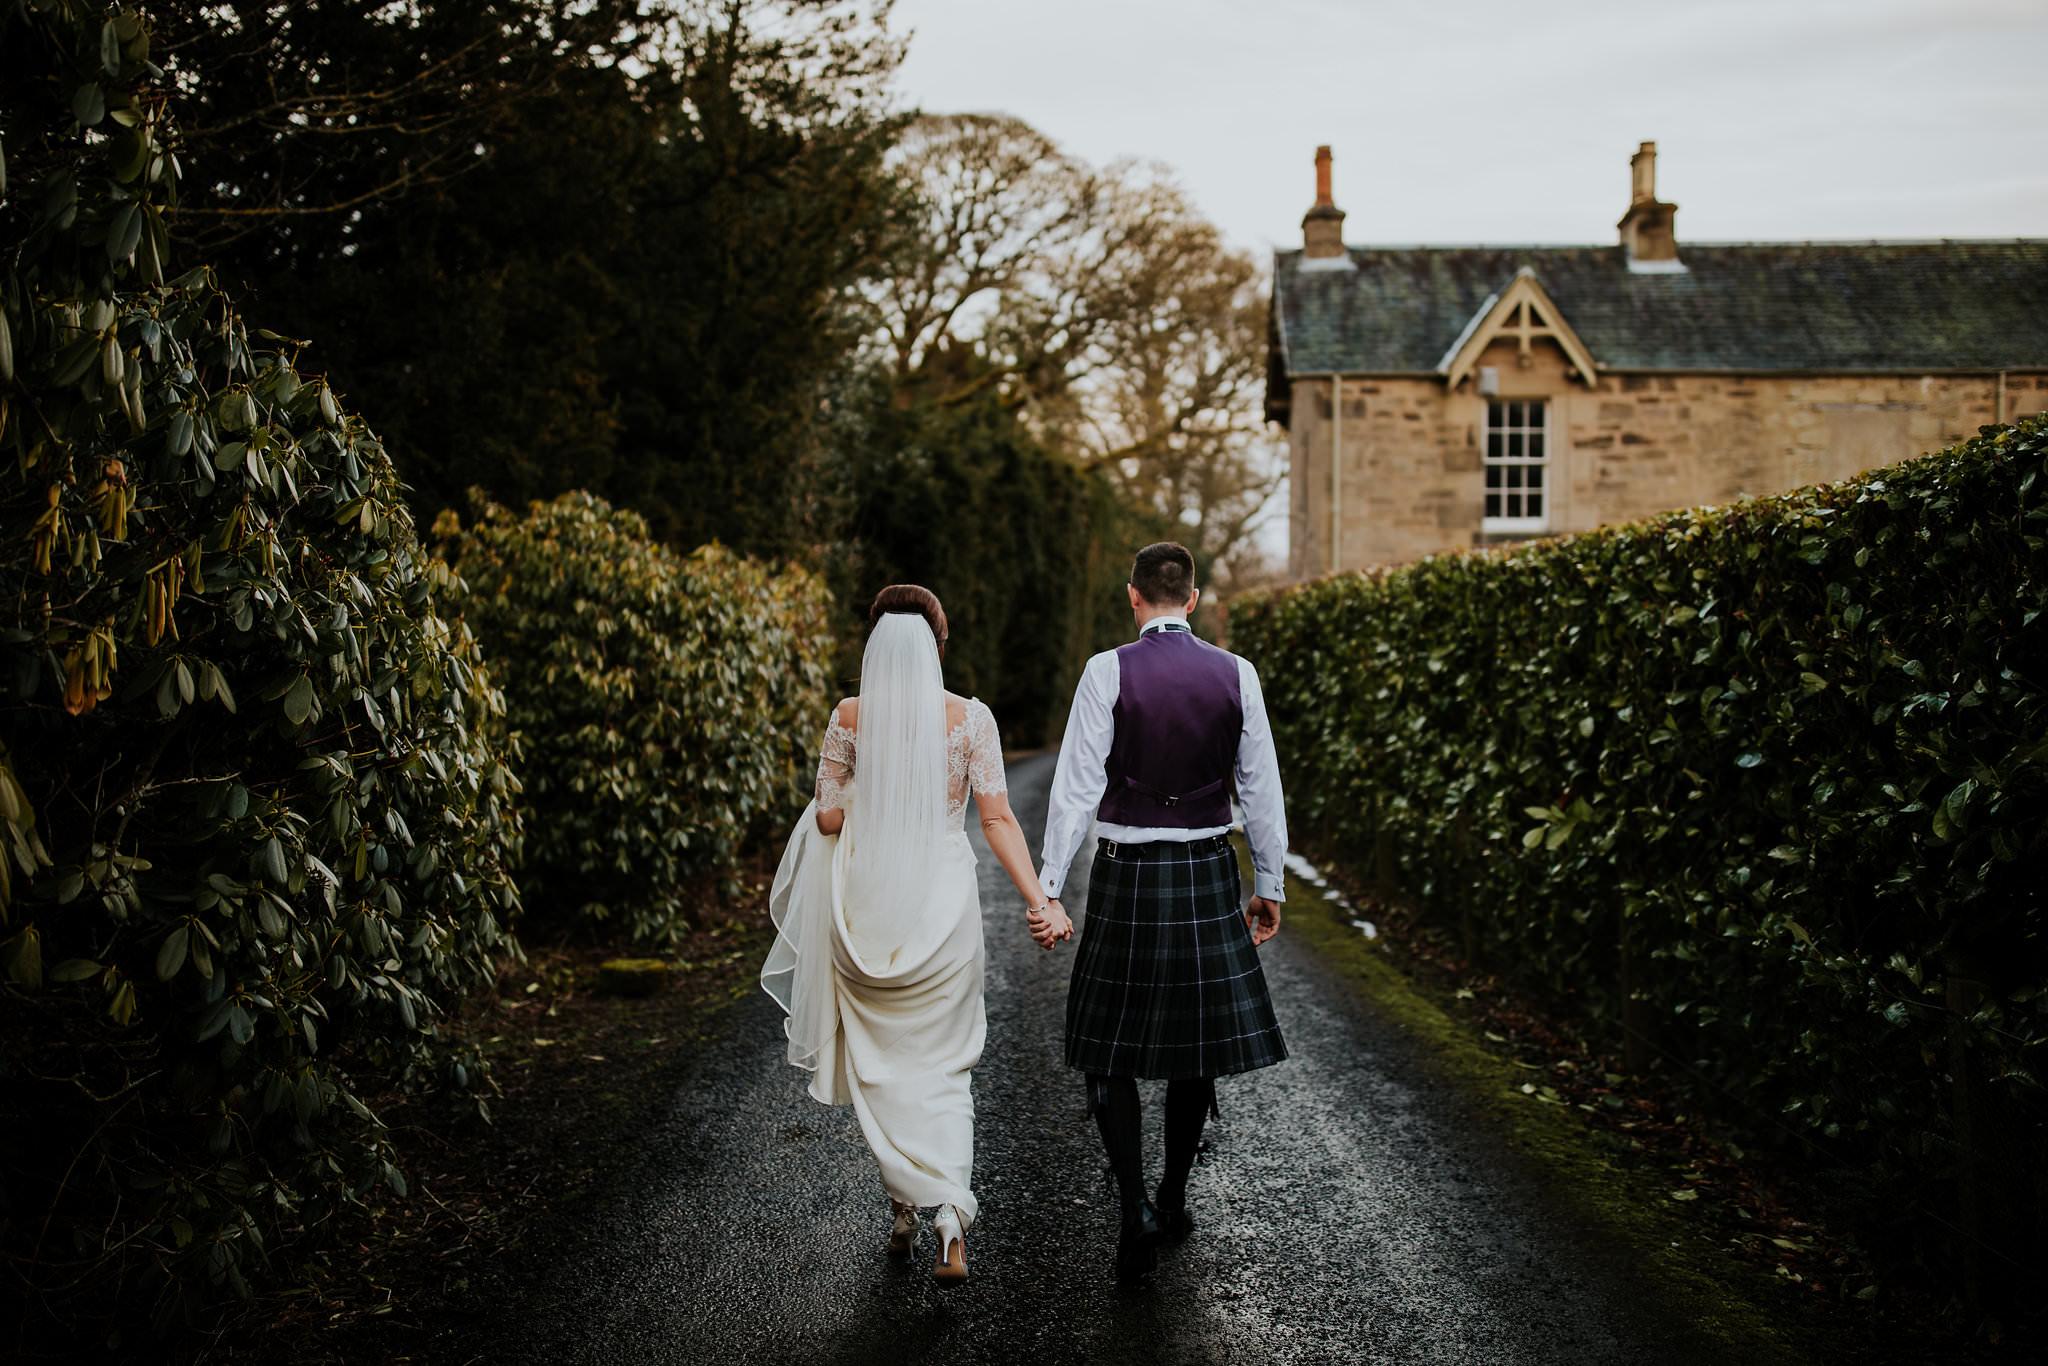 kirknewton stables wedding photographer (74).jpg